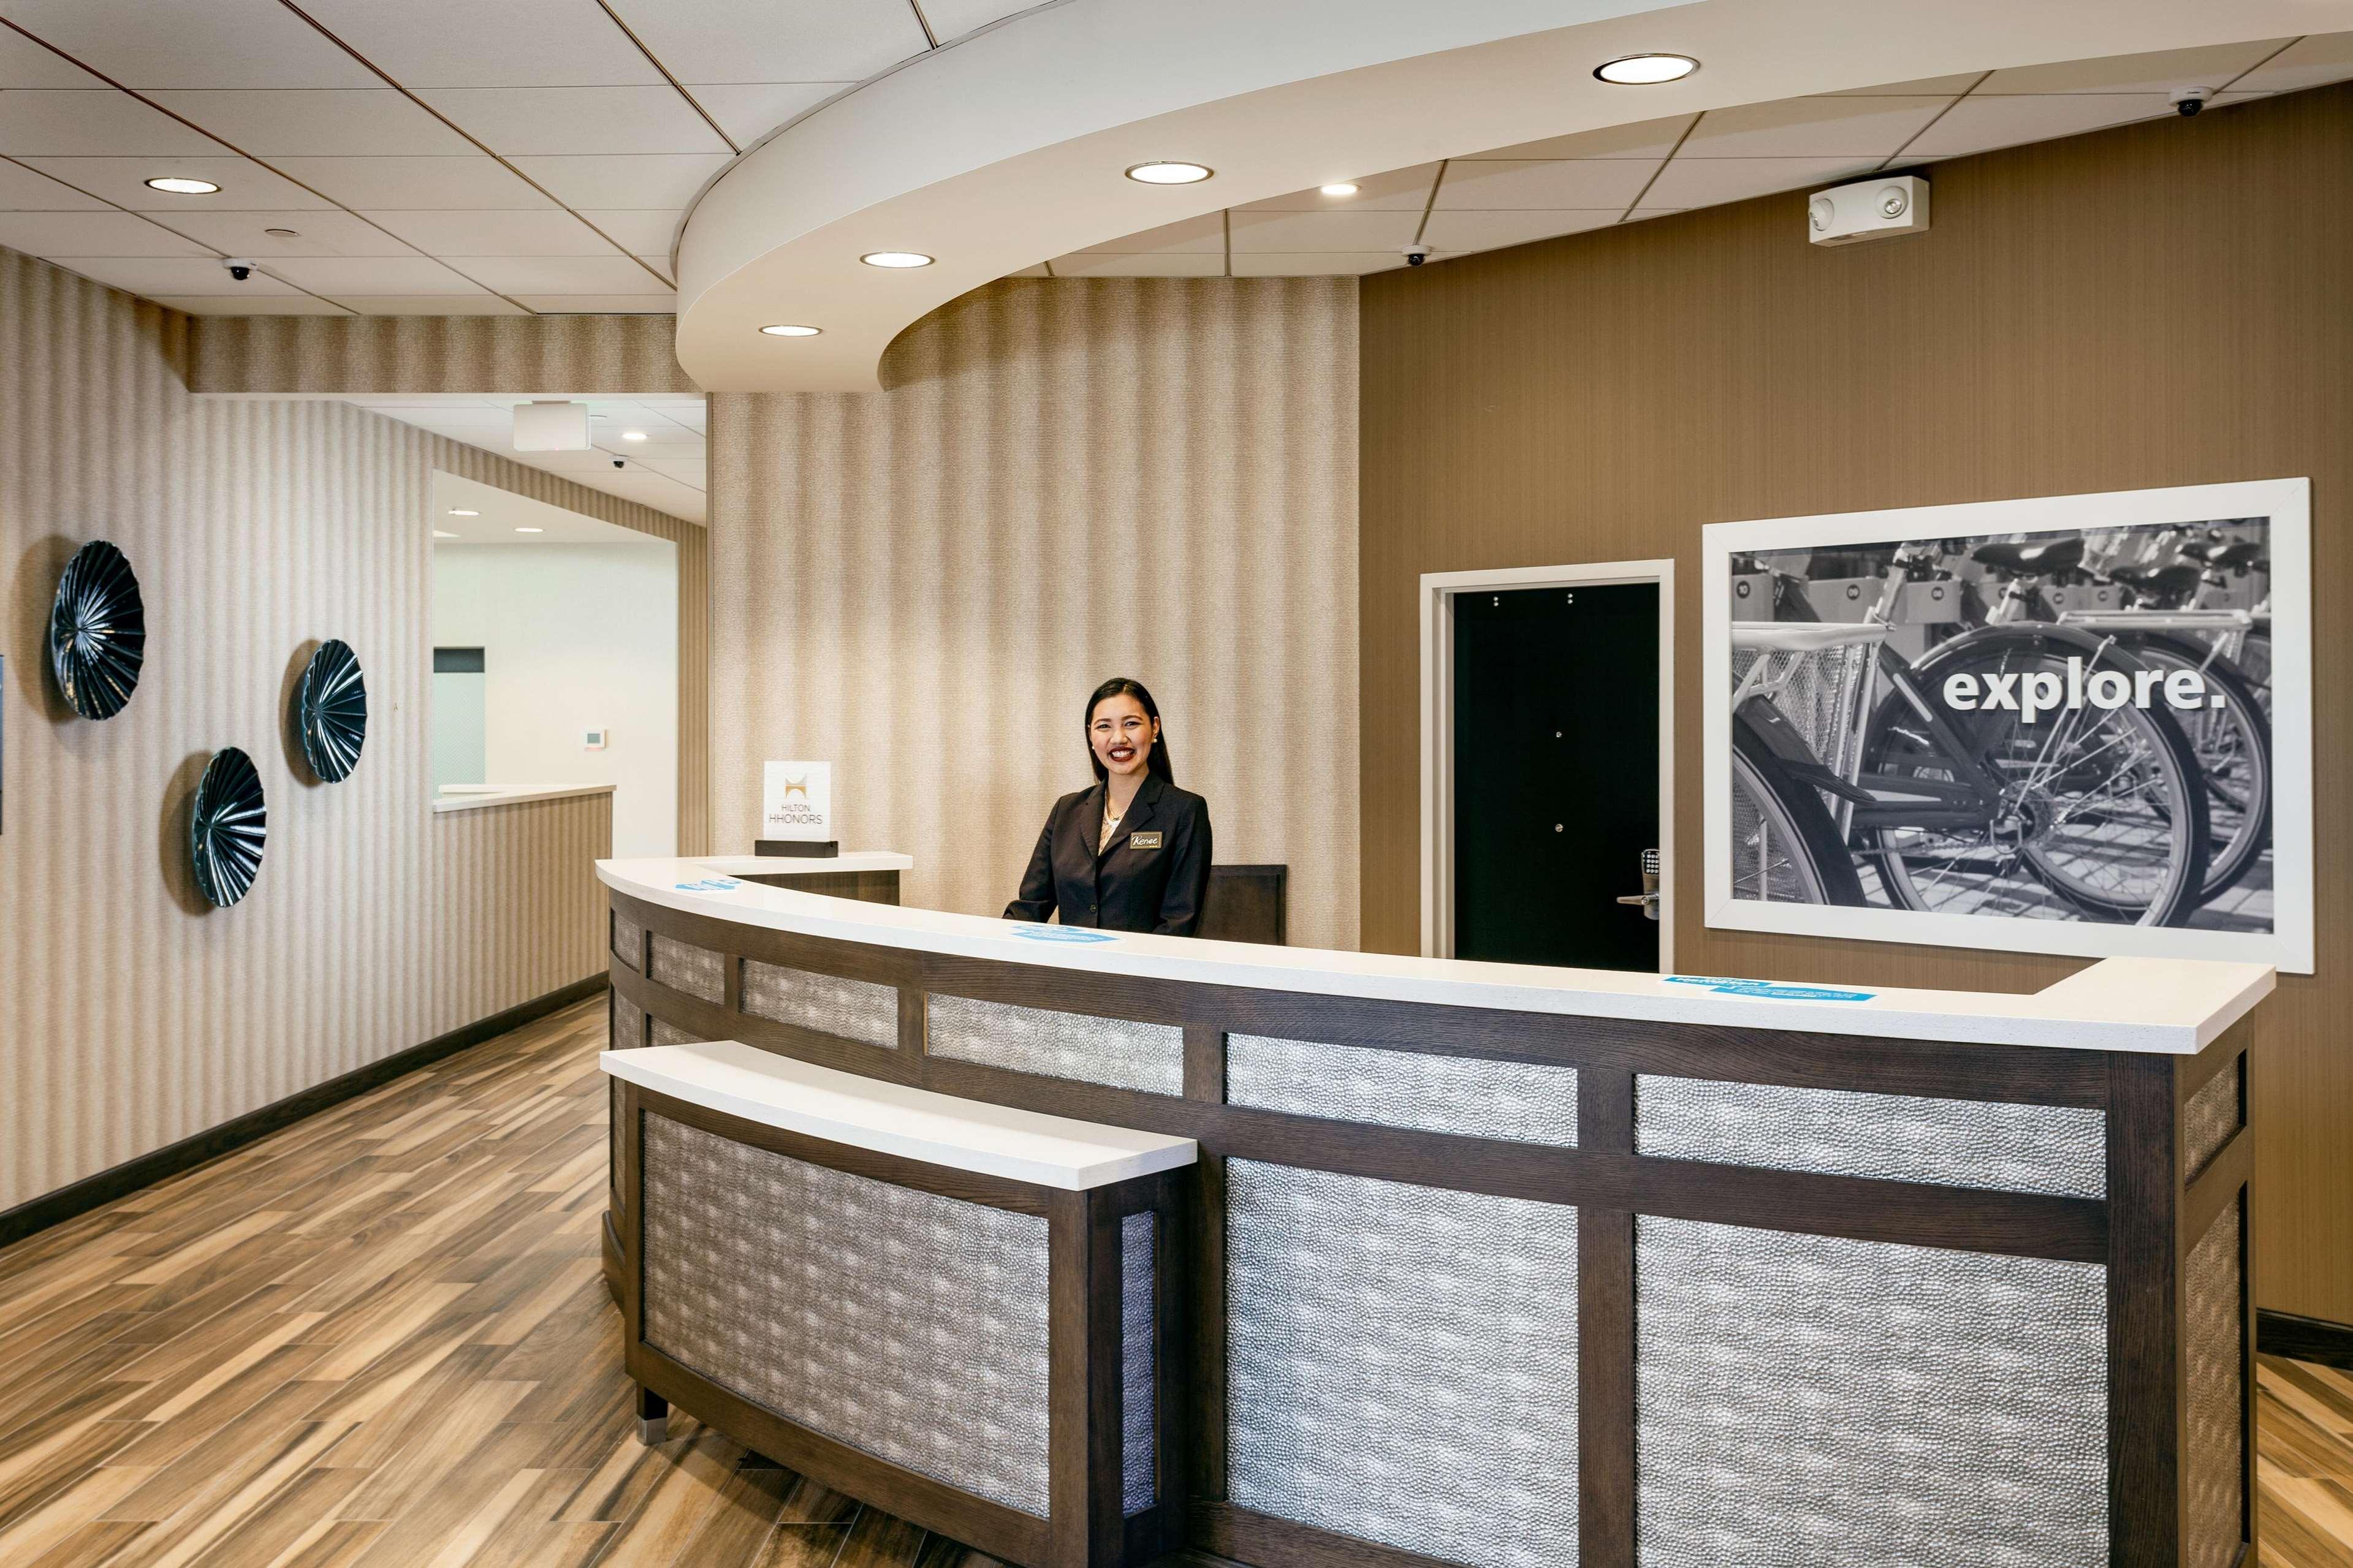 Hampton Inn & Suites by Hilton Seattle/Northgate image 17